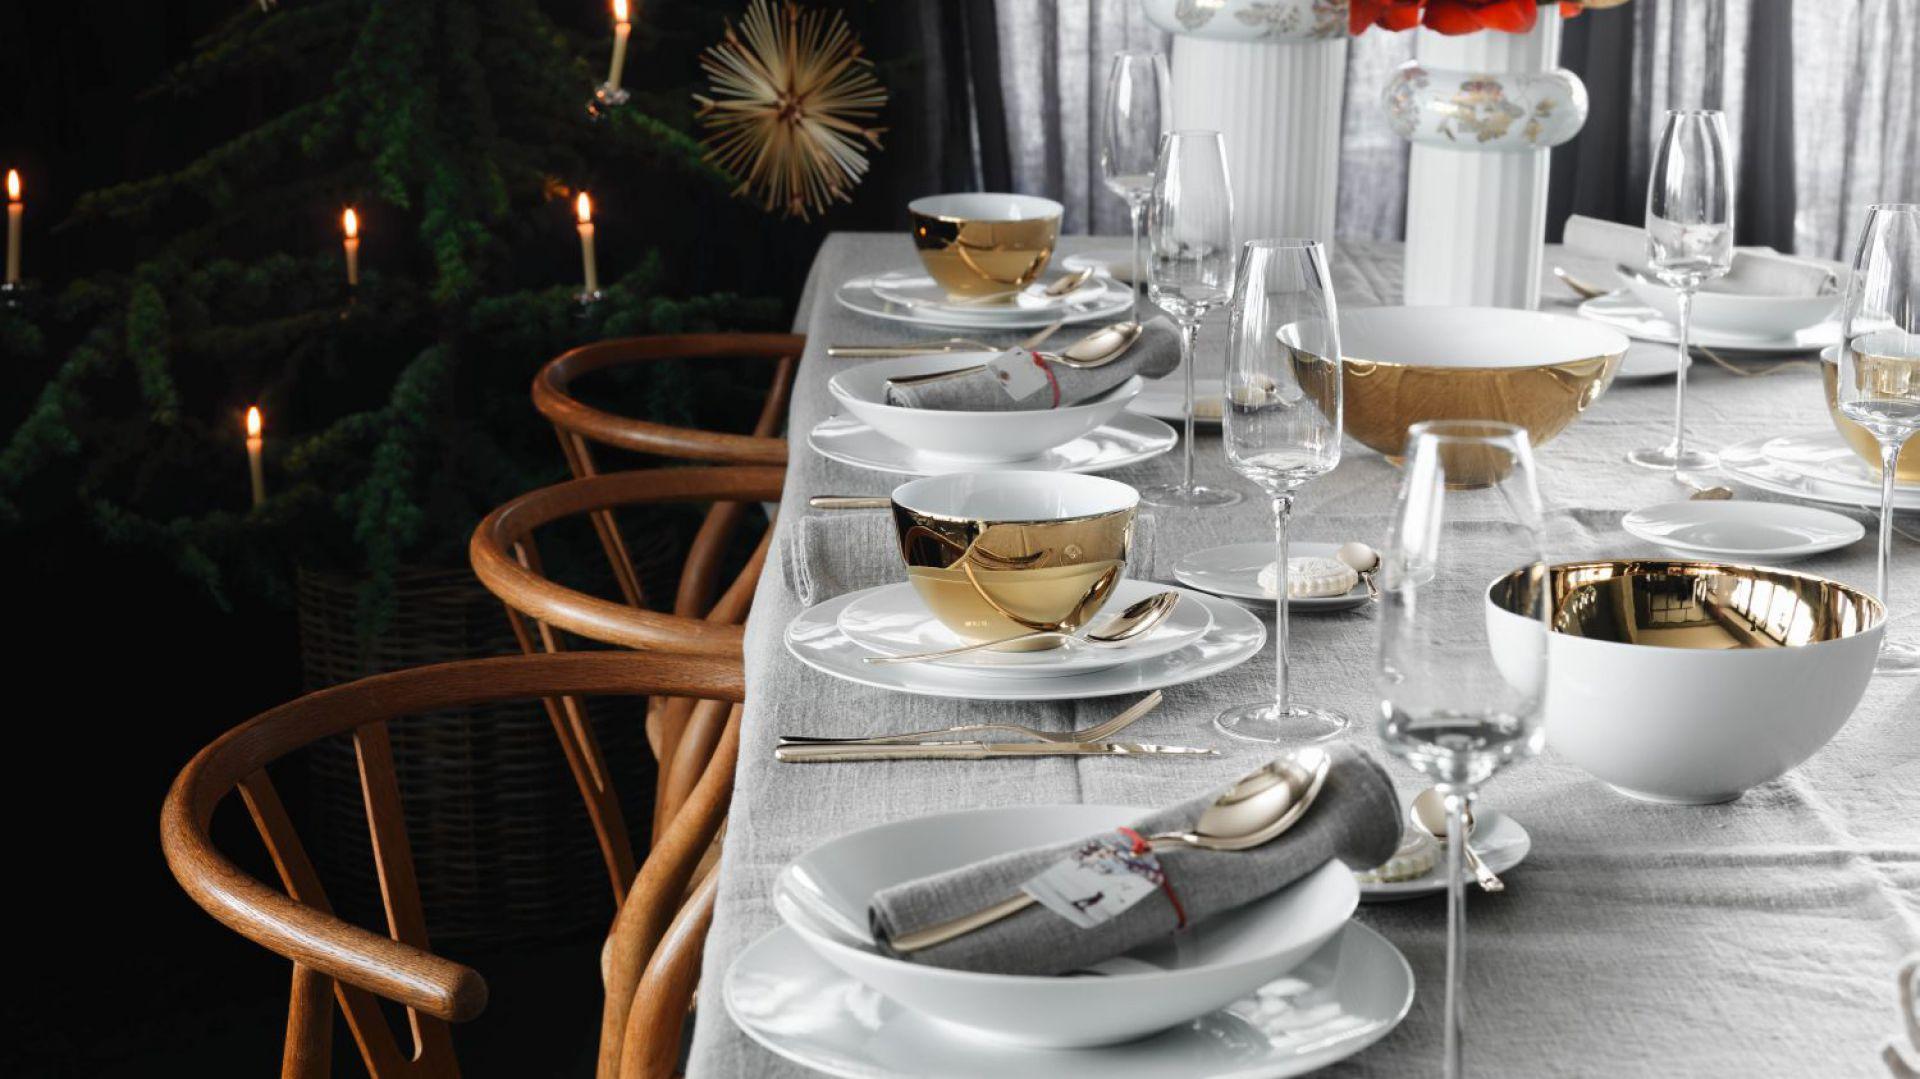 Stół na święta. Fot. Rosenthal